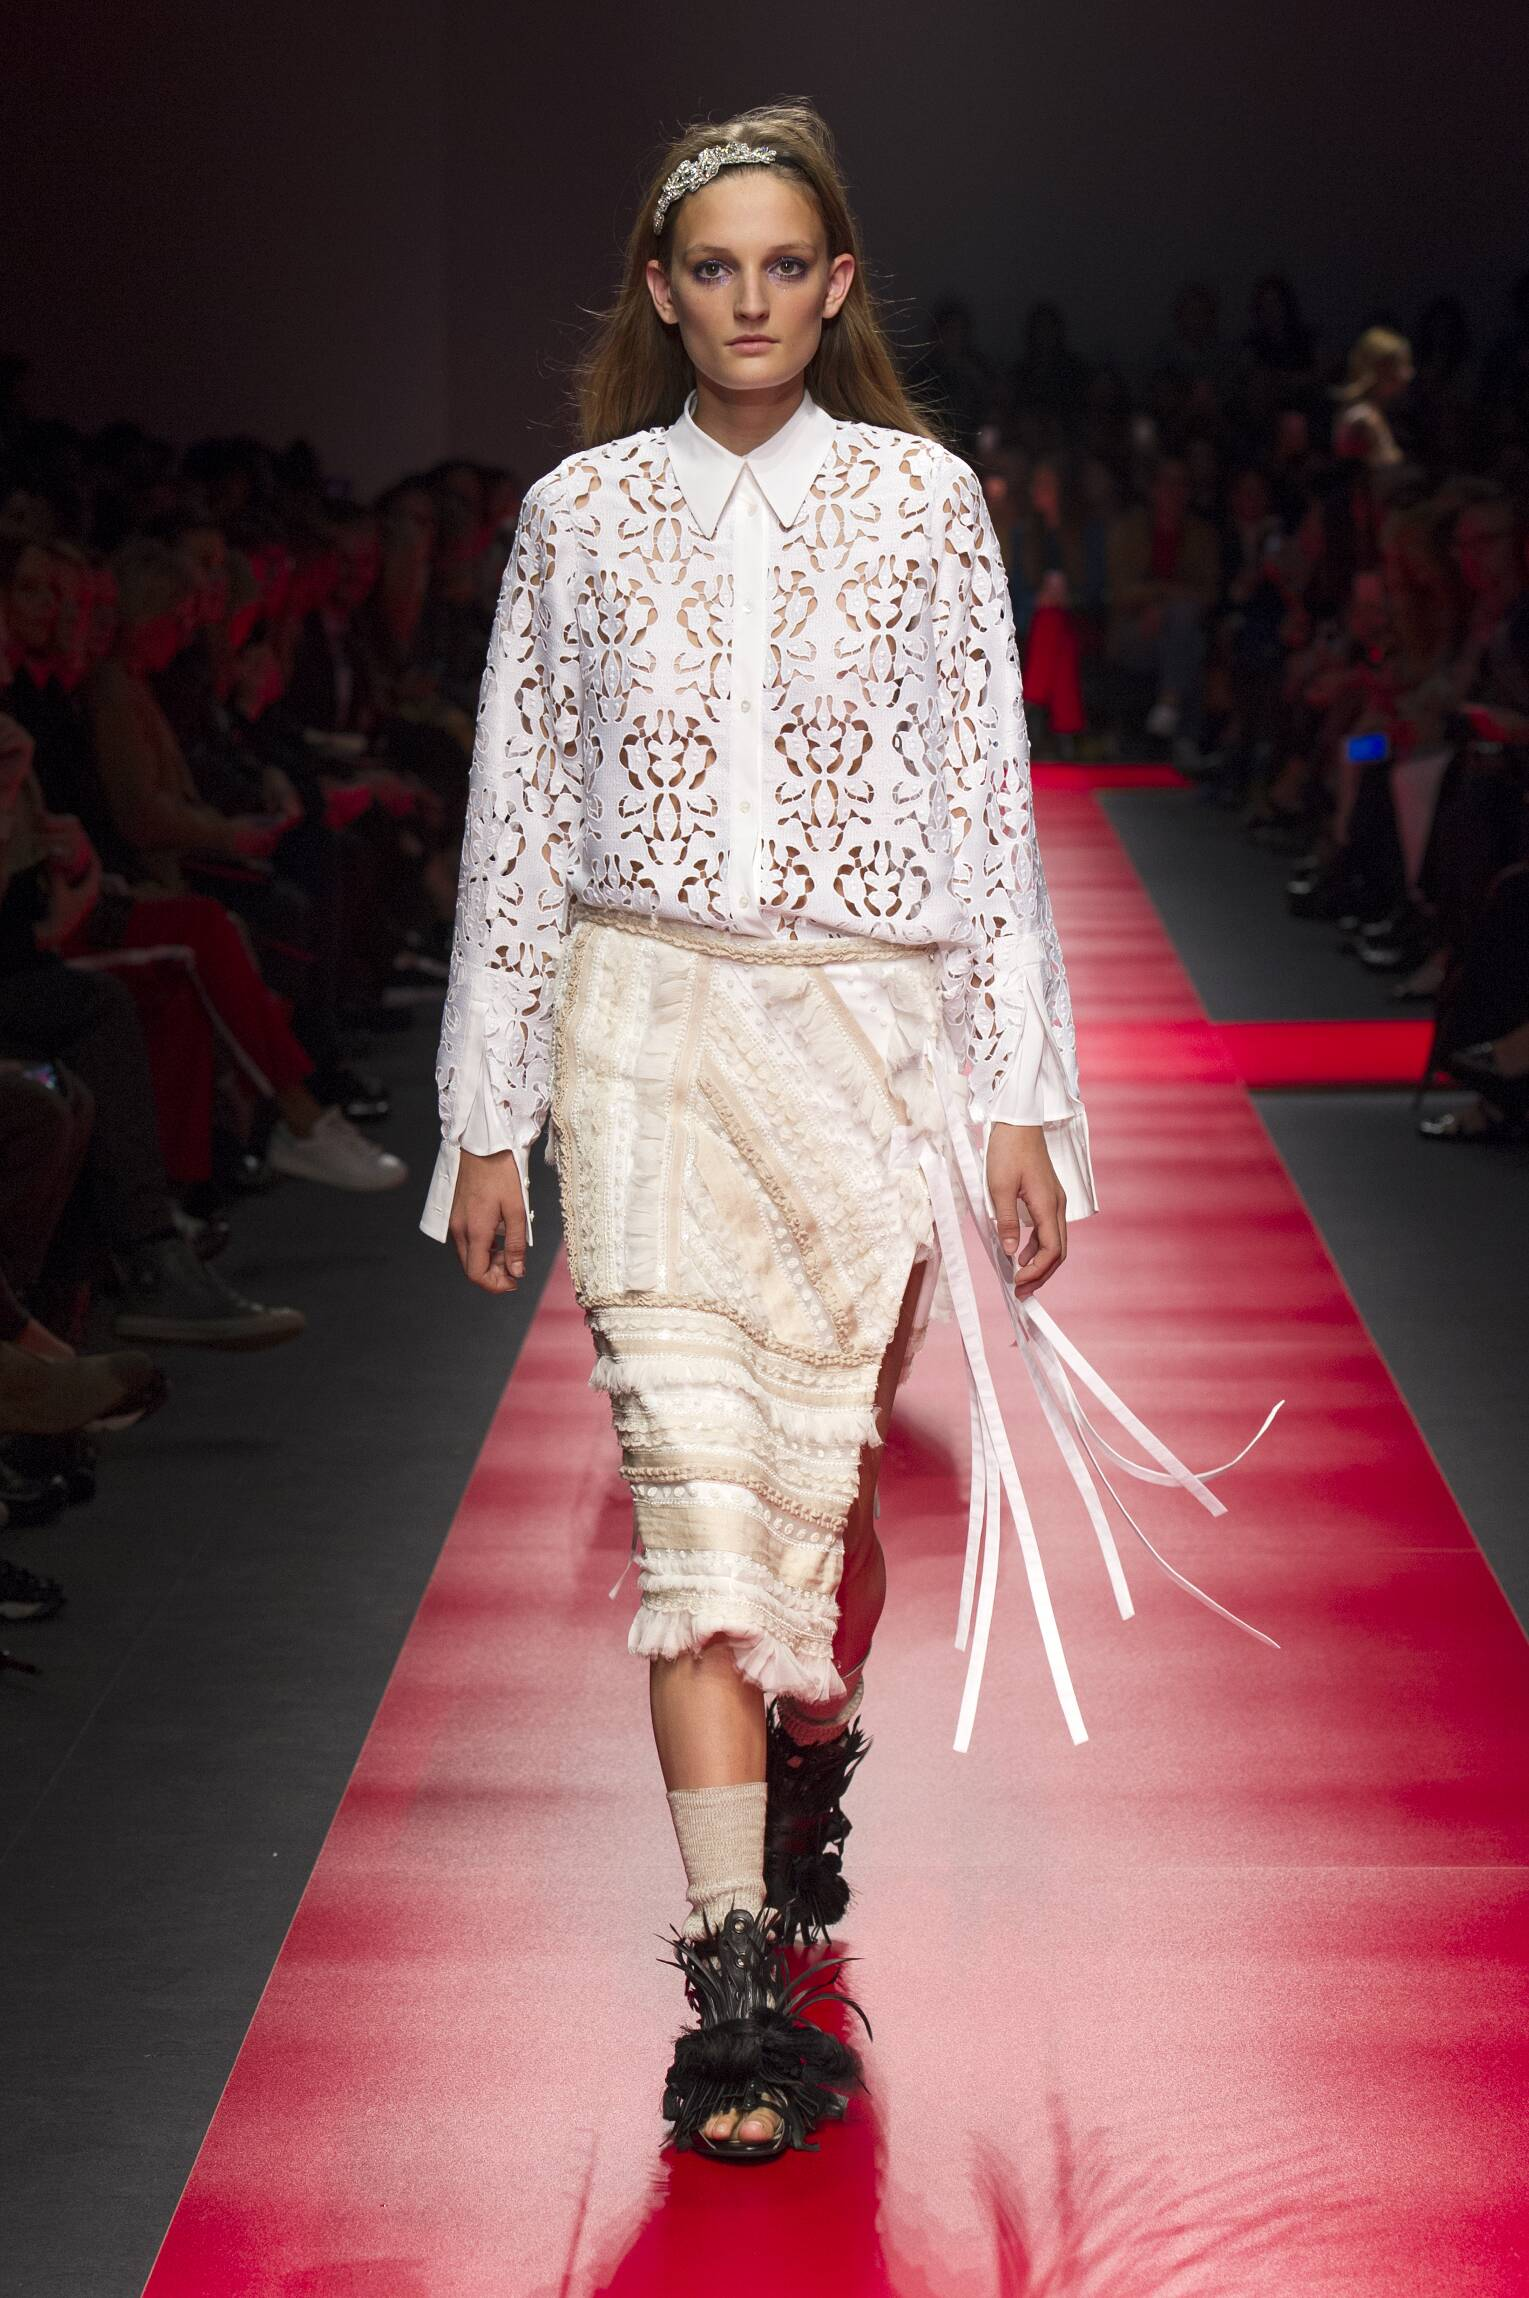 Spring 2016 Woman Fashion Show N°21